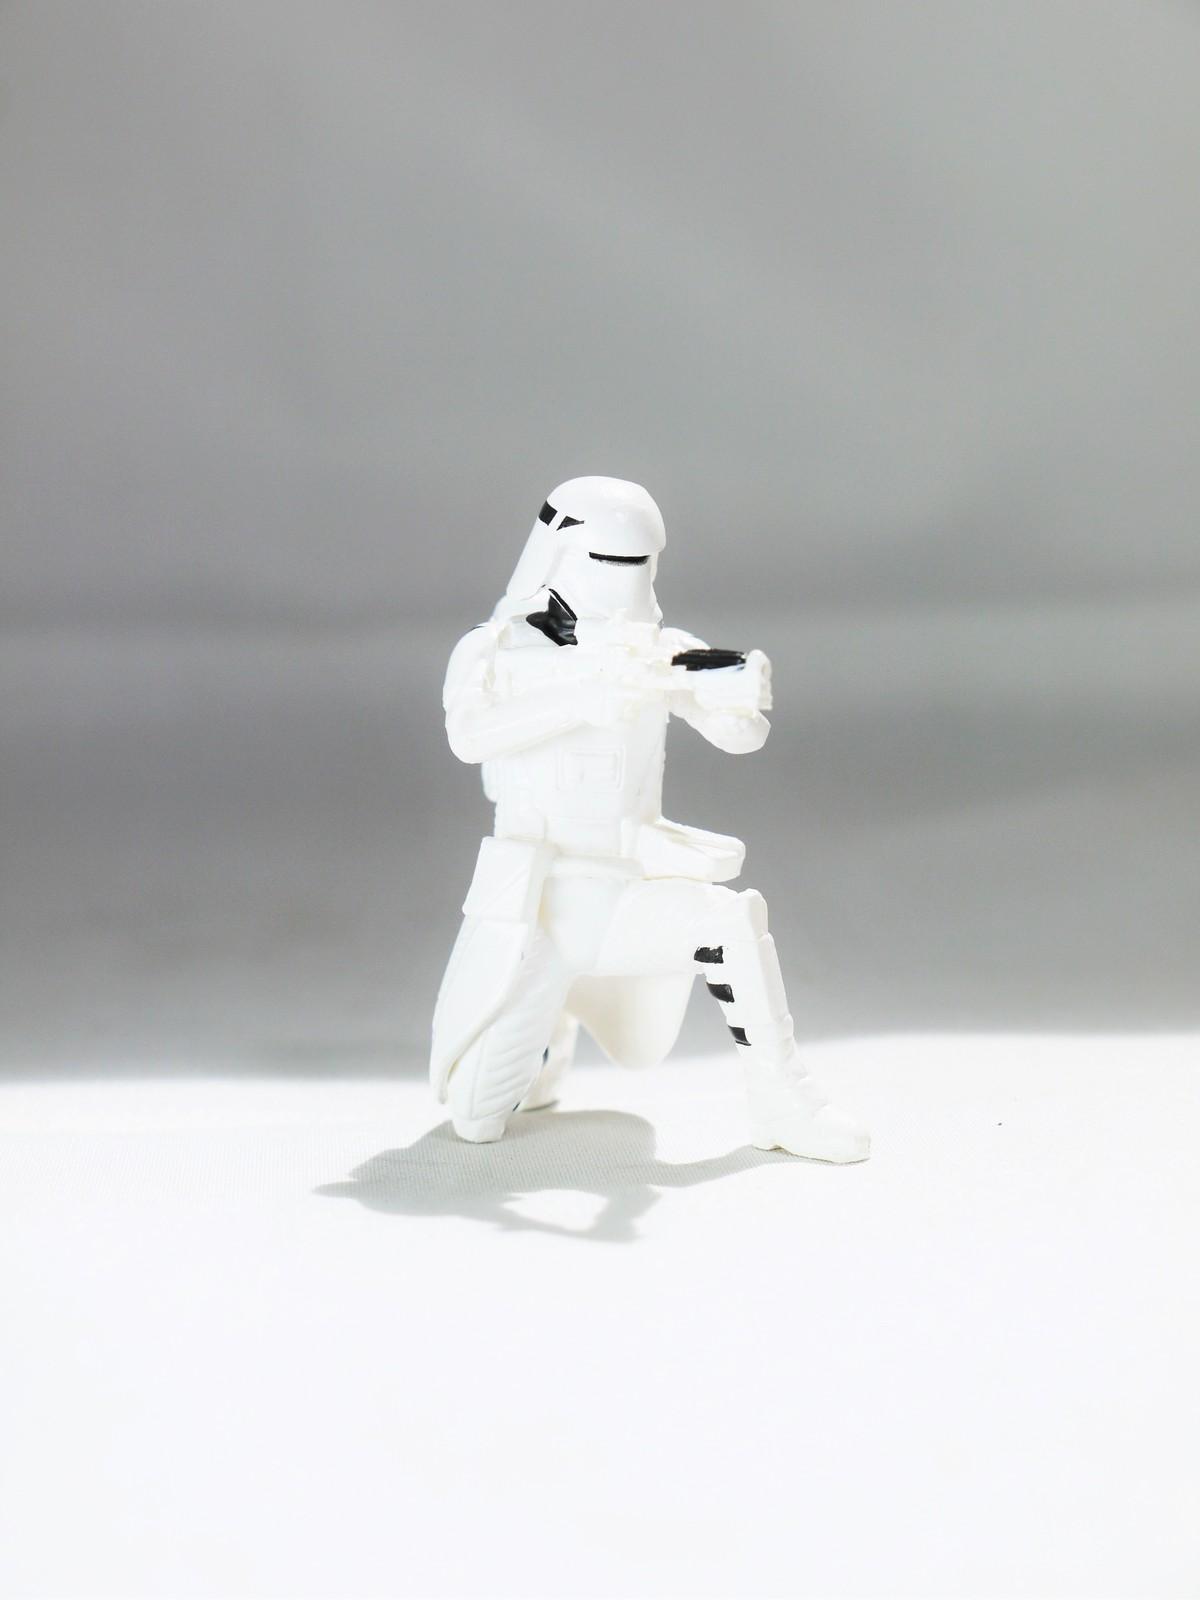 Arts_star_wars_char_gacha_galaxy_desktop_first_order_p2_-_snowtrooper_-_01